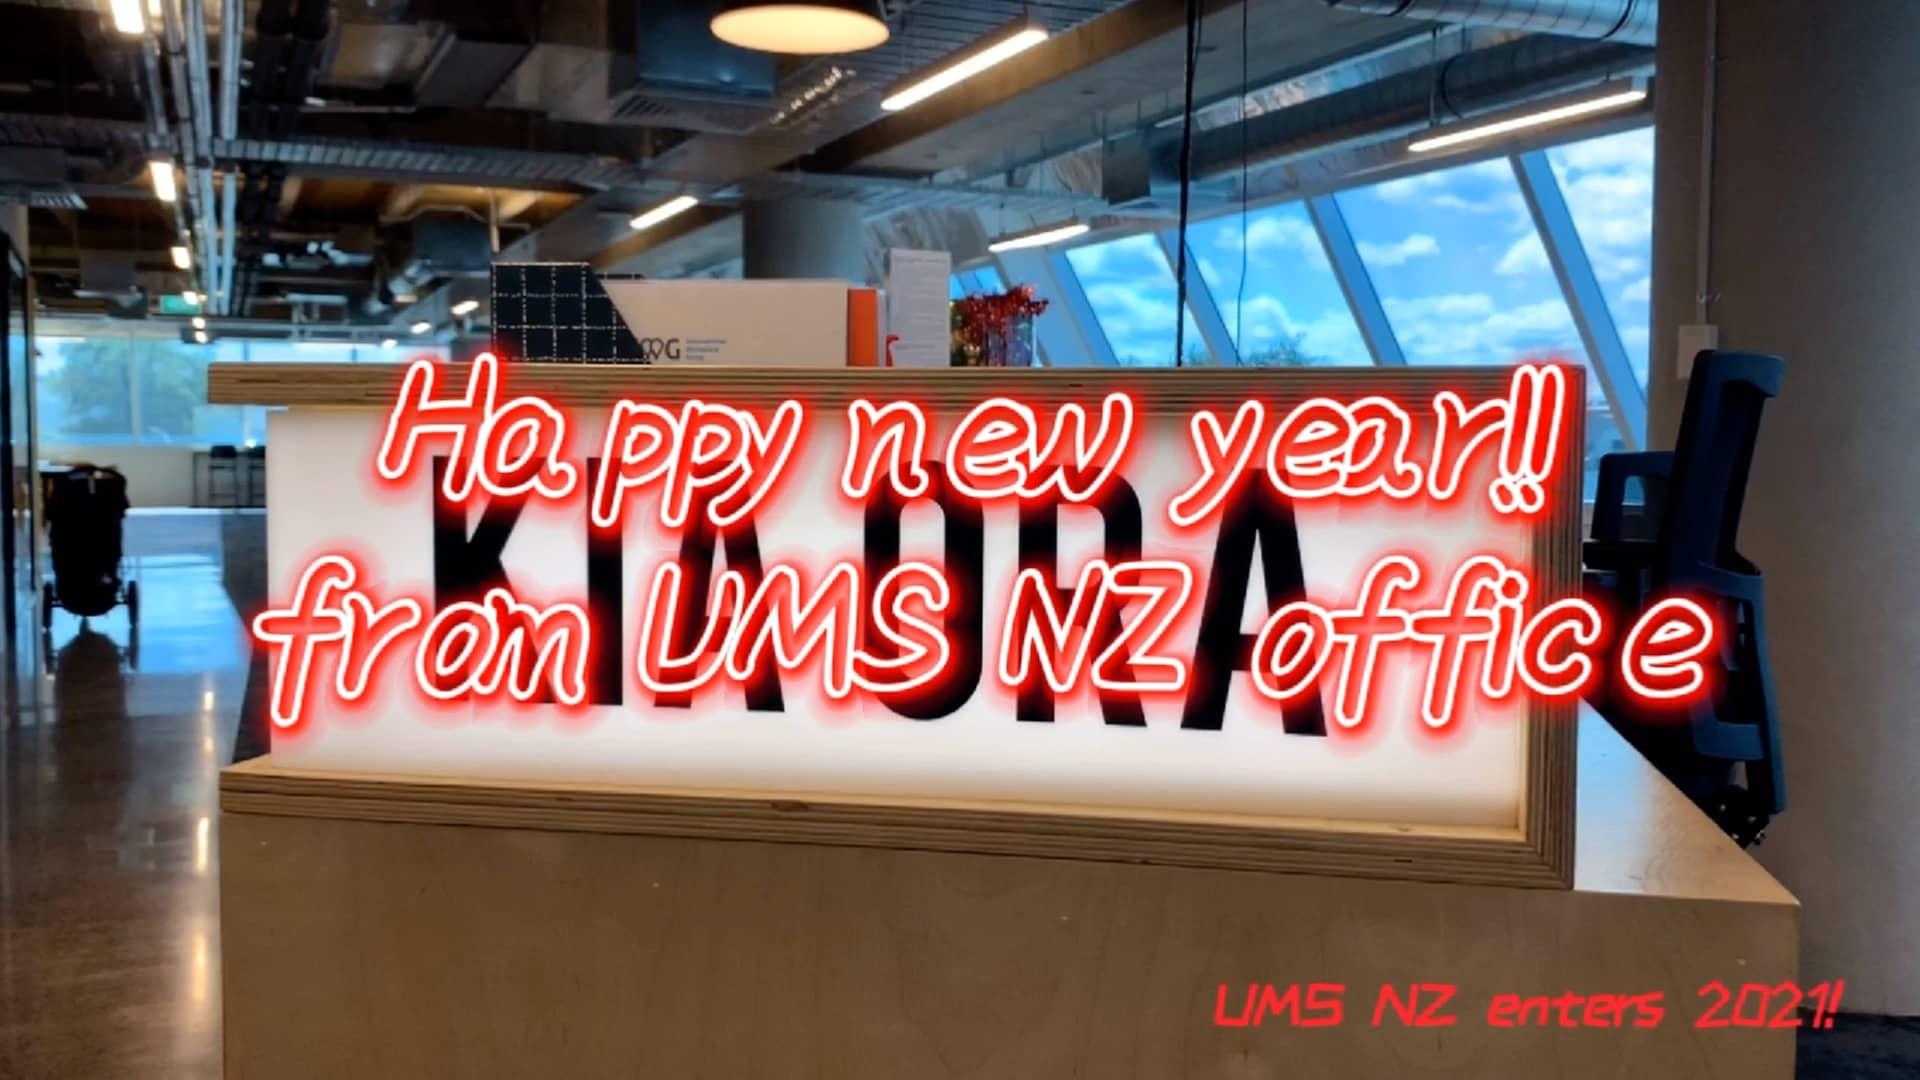 UMS NZ Enters 2021!